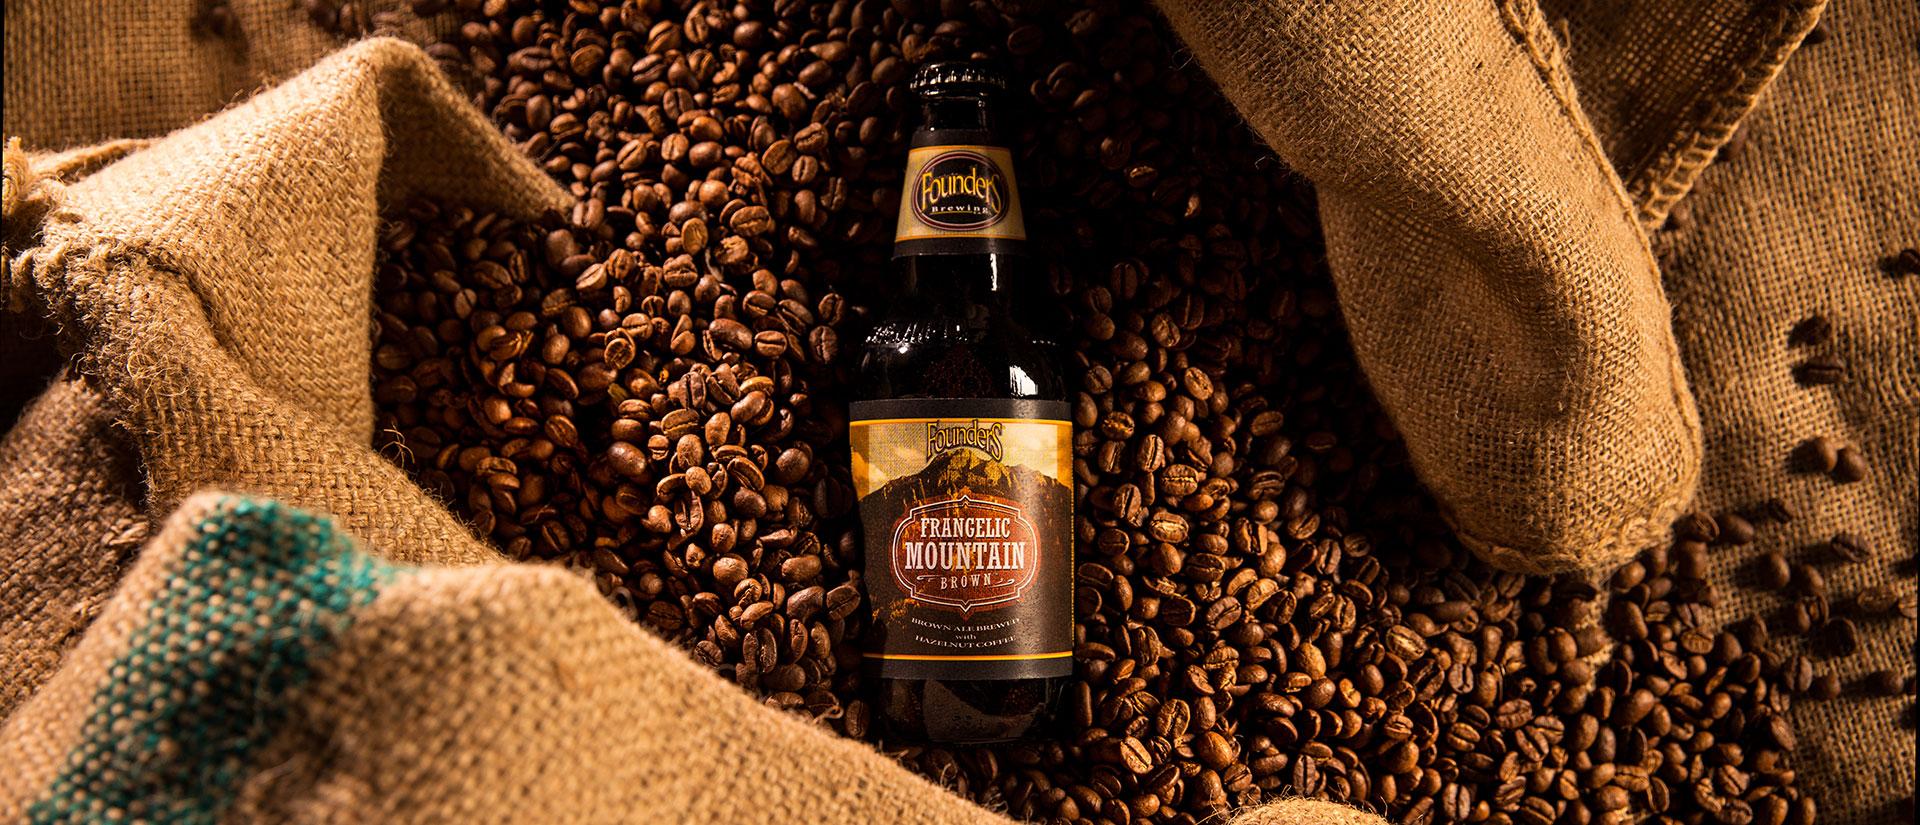 Bottle of Founders Frangelic Mountain Brown sitting in espresso bean s